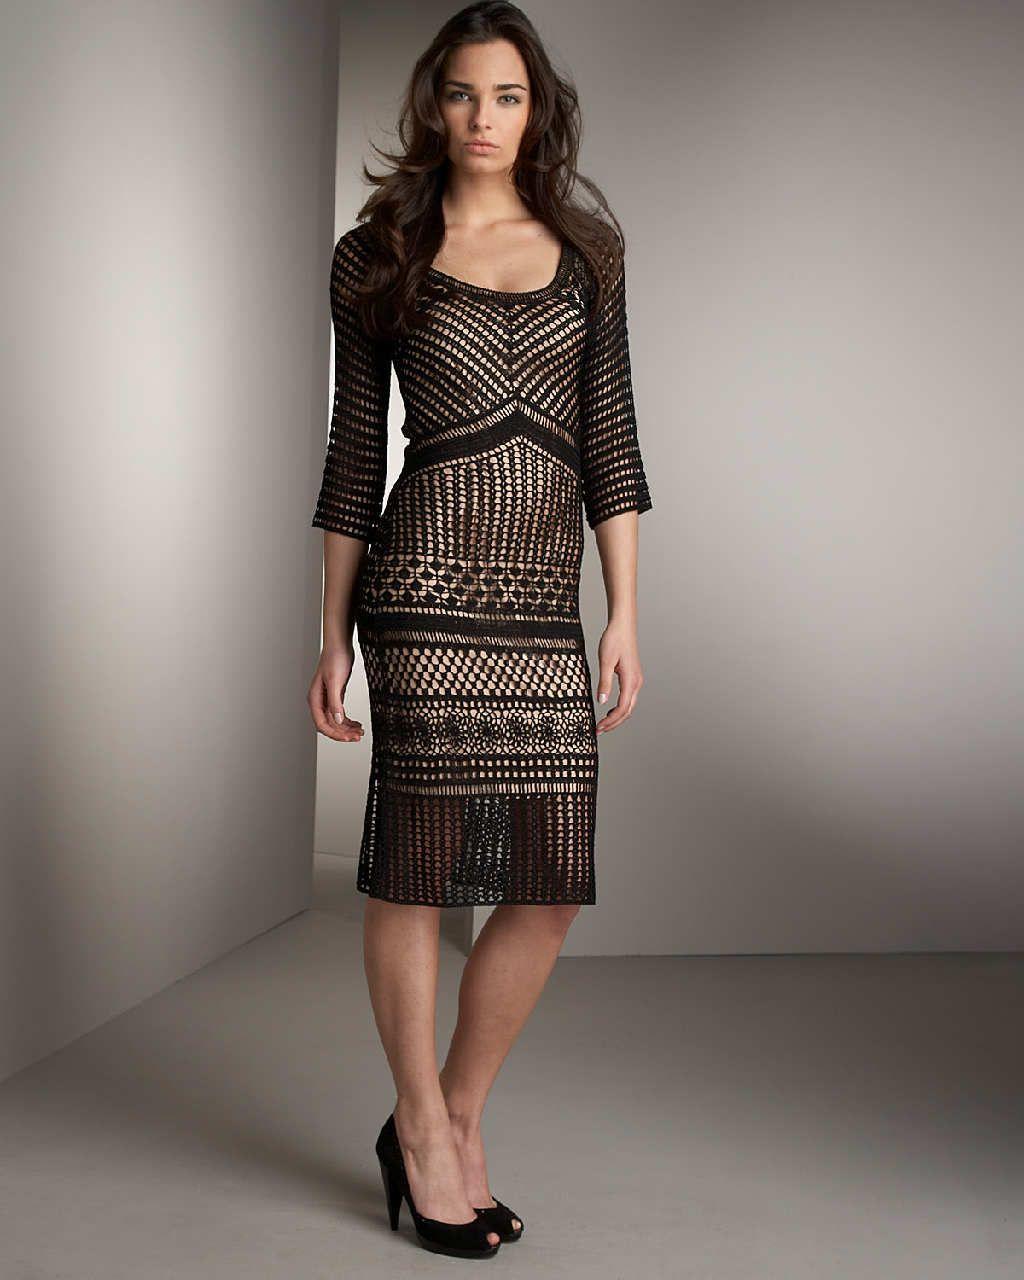 Crinochet: Neiman Marcus Black Dress